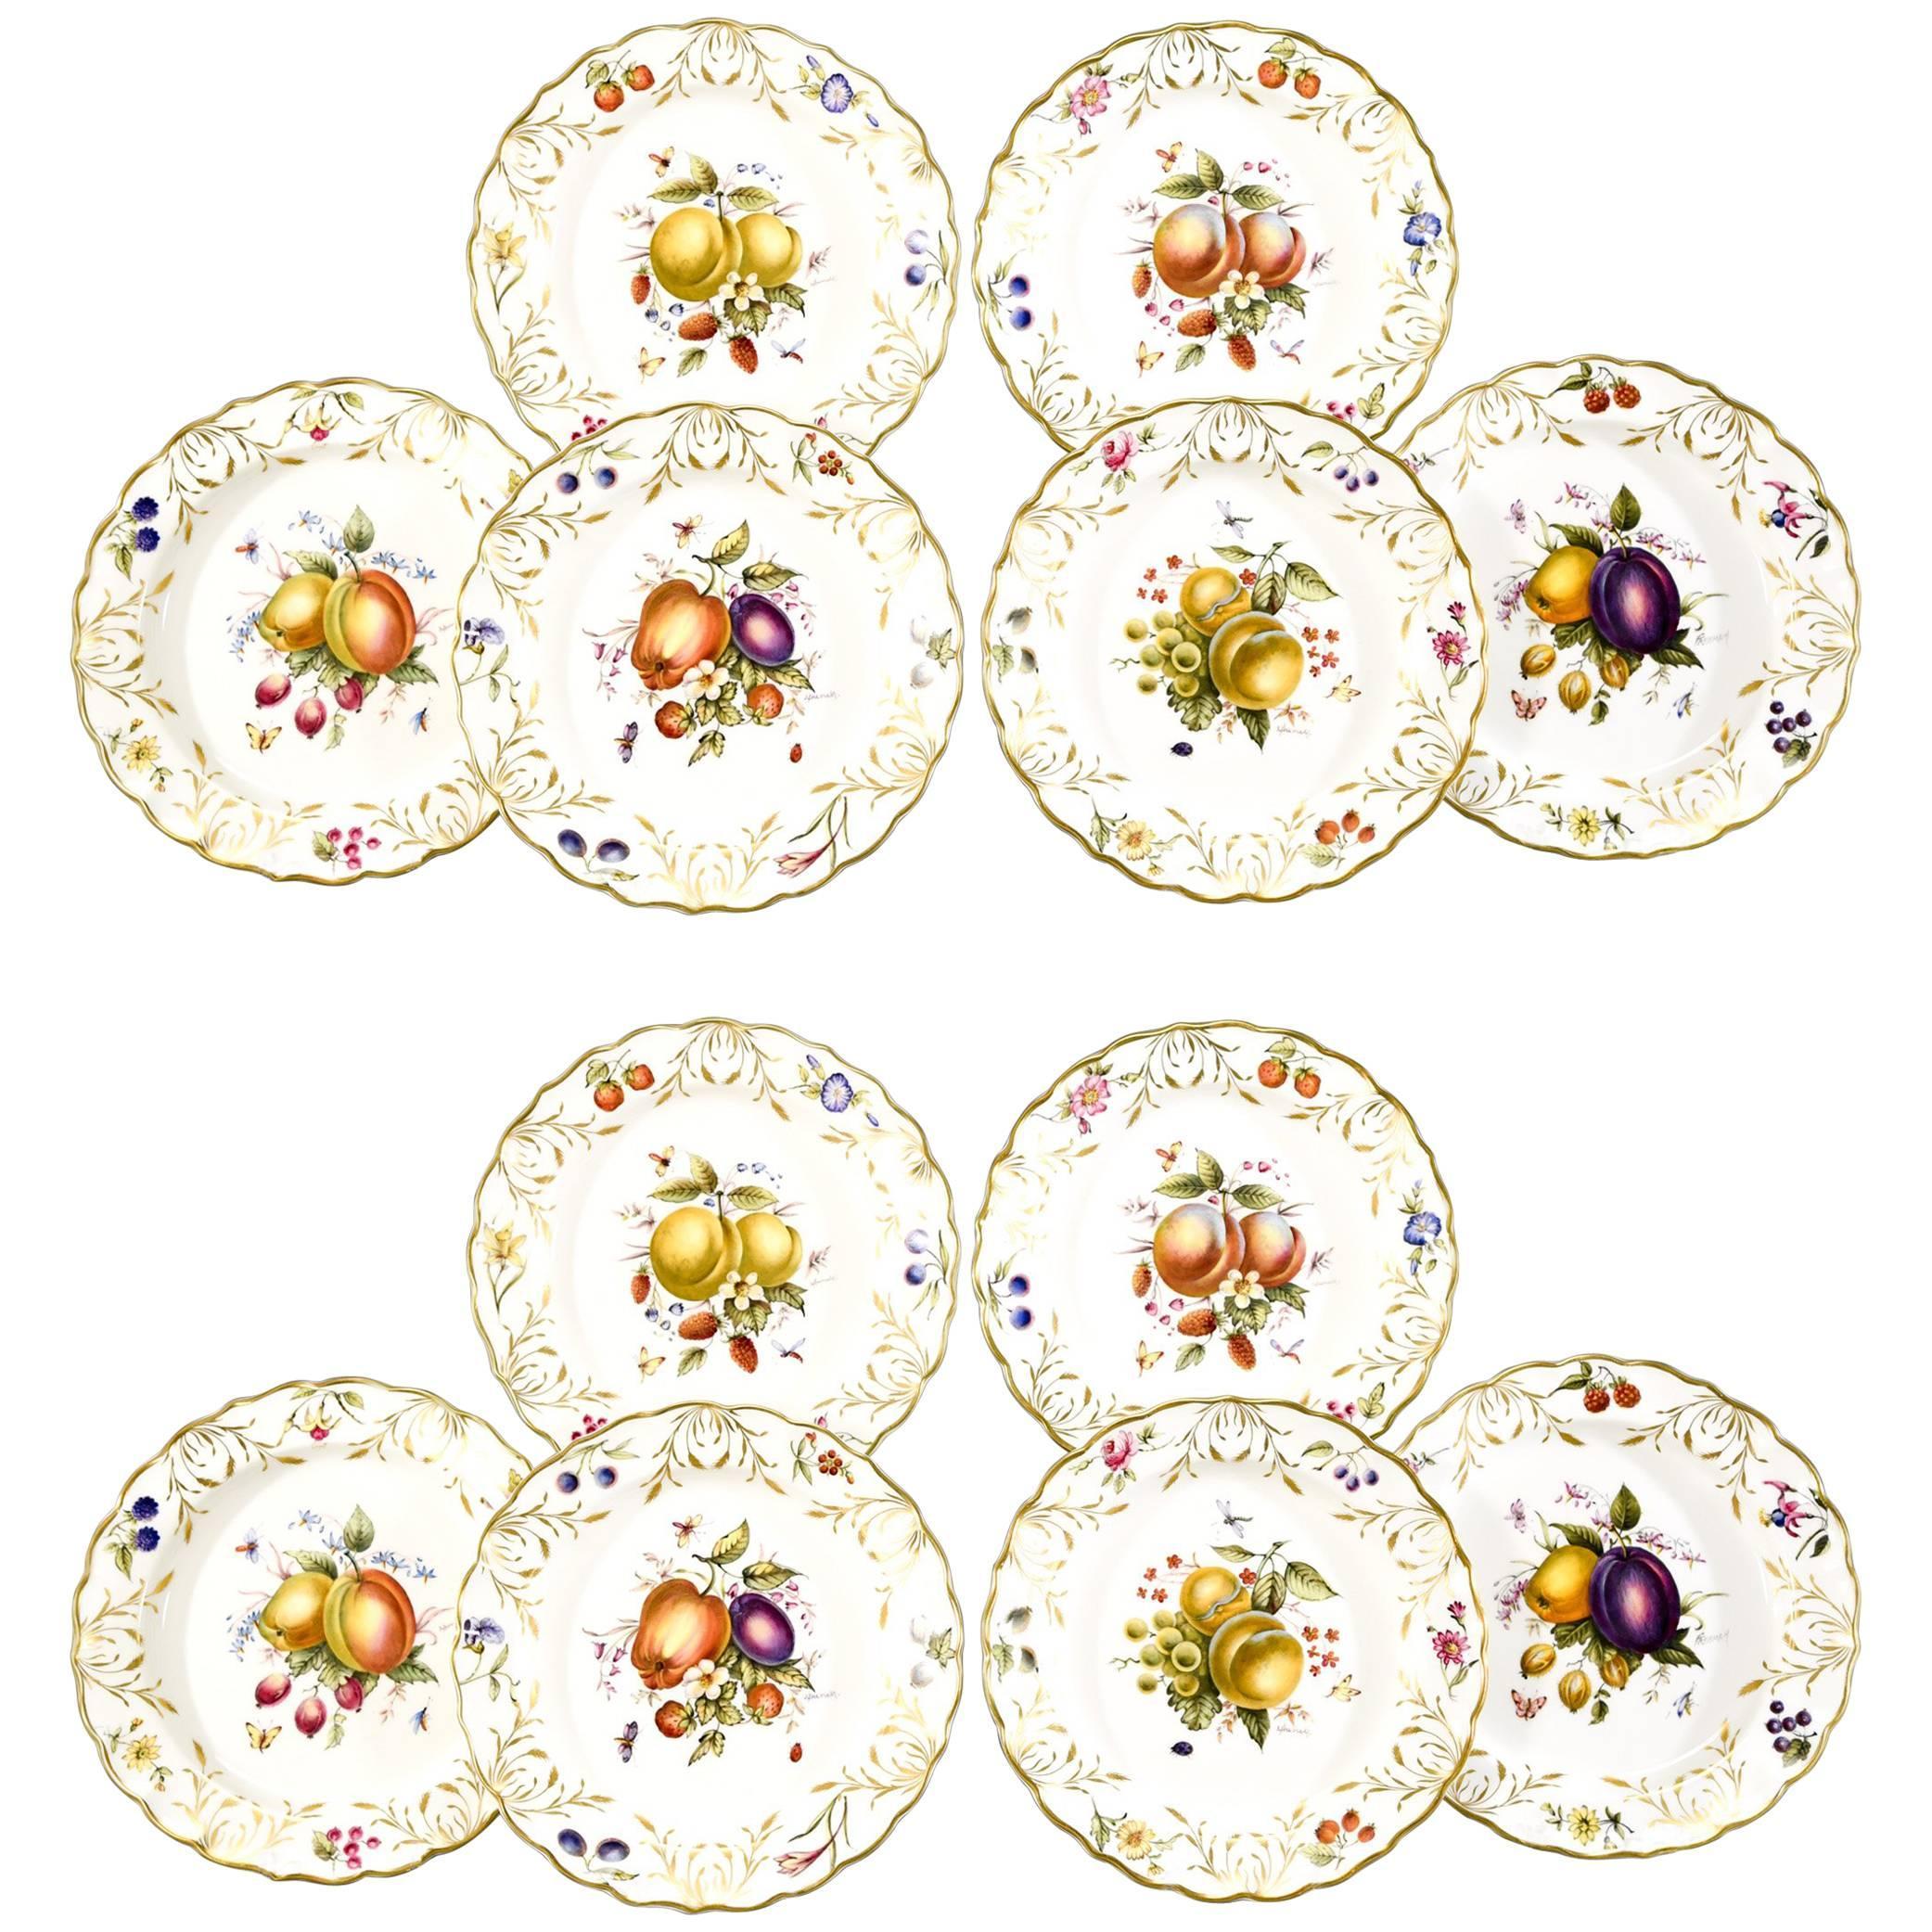 12 Royal Worcester Hand-Painted Dessert Plates with Fruit Artist Signed Hummel